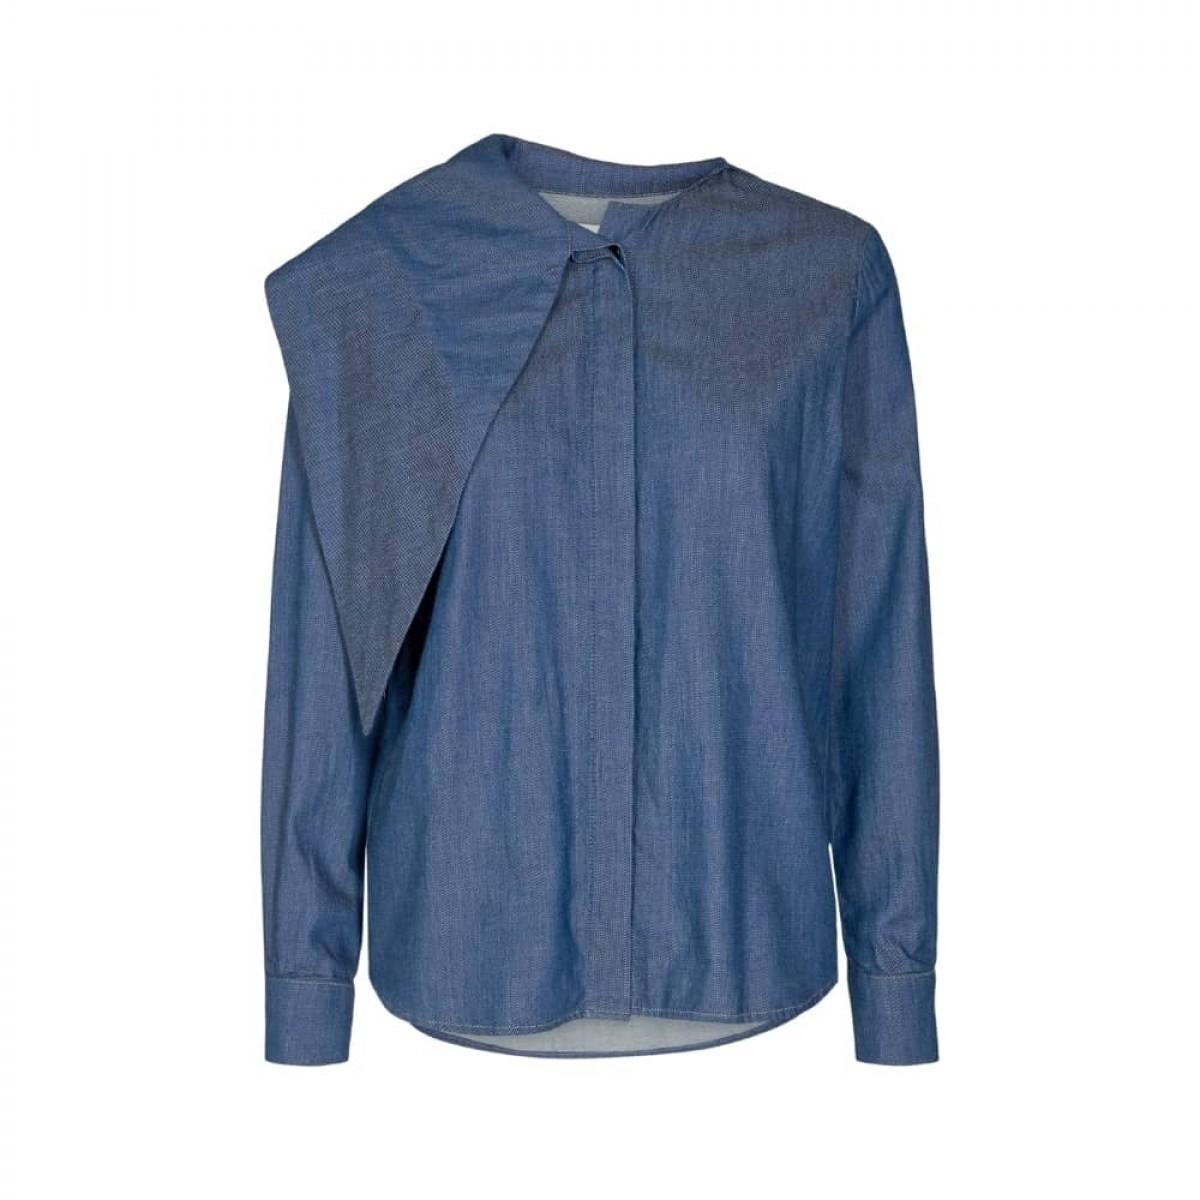 marston bow shirt - denim blue - front